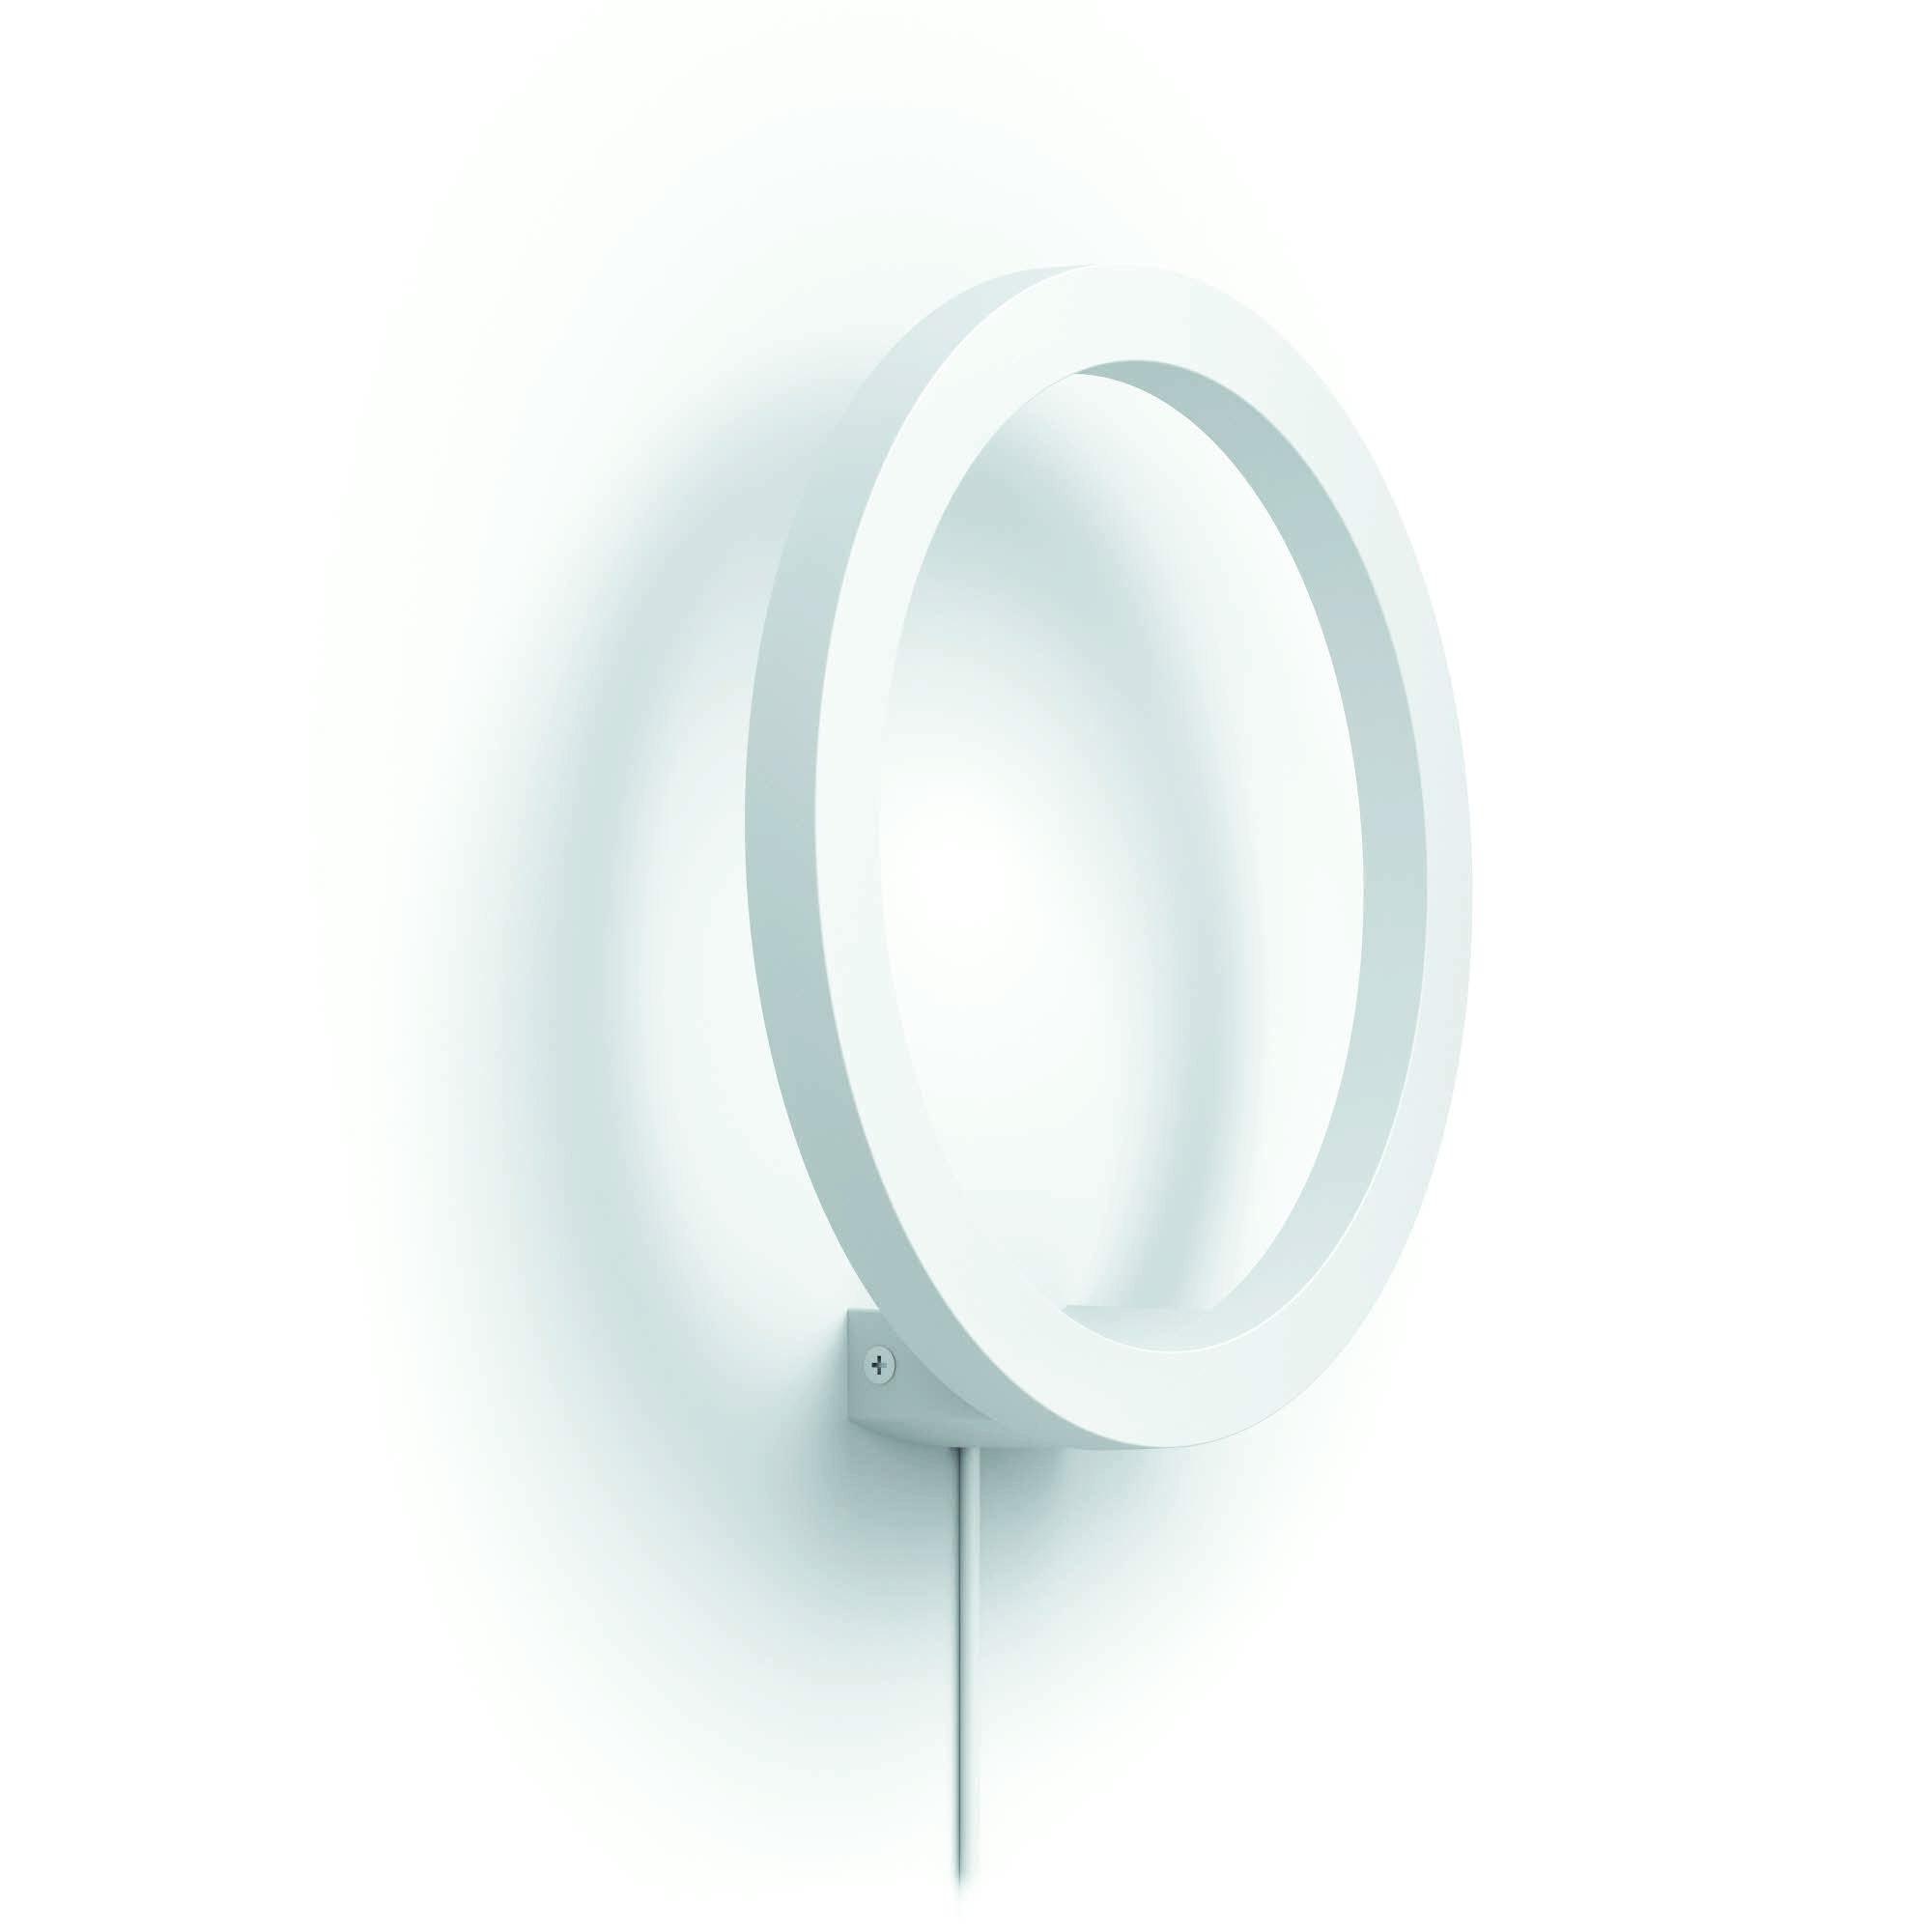 Philips HUE SANA Applique LED 1x20W/1500lm Blanc